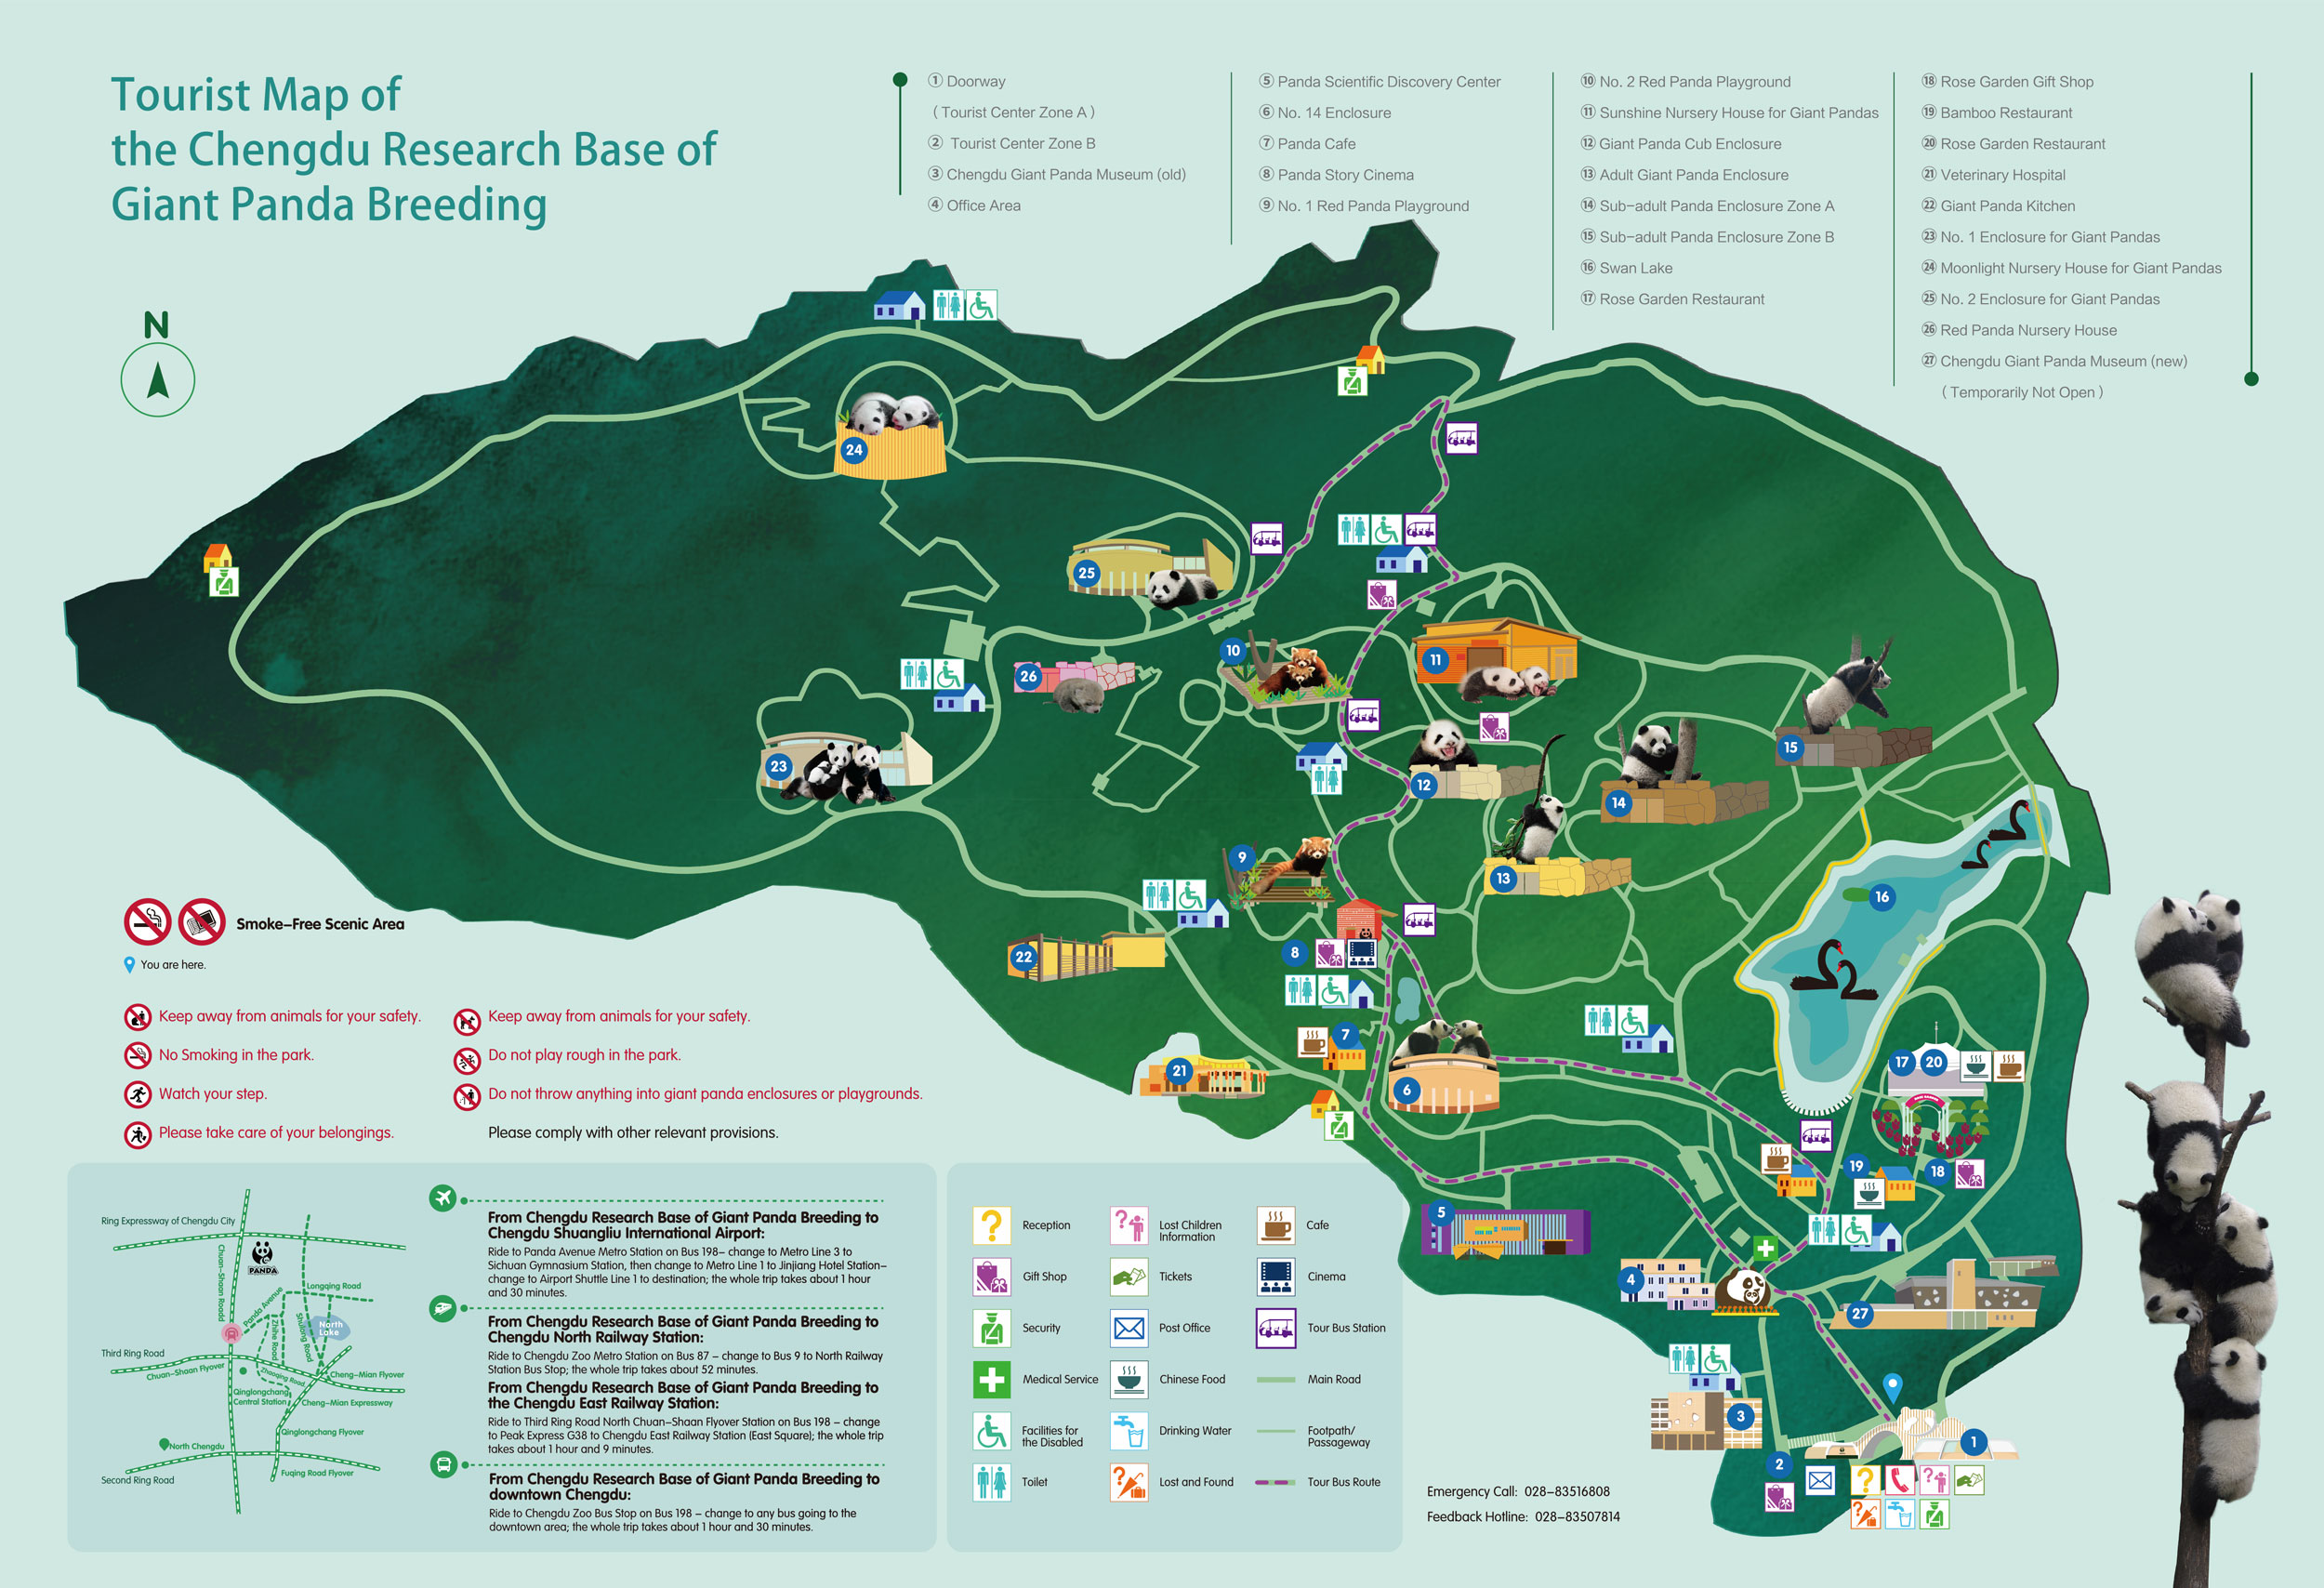 chengdu panda base tour map